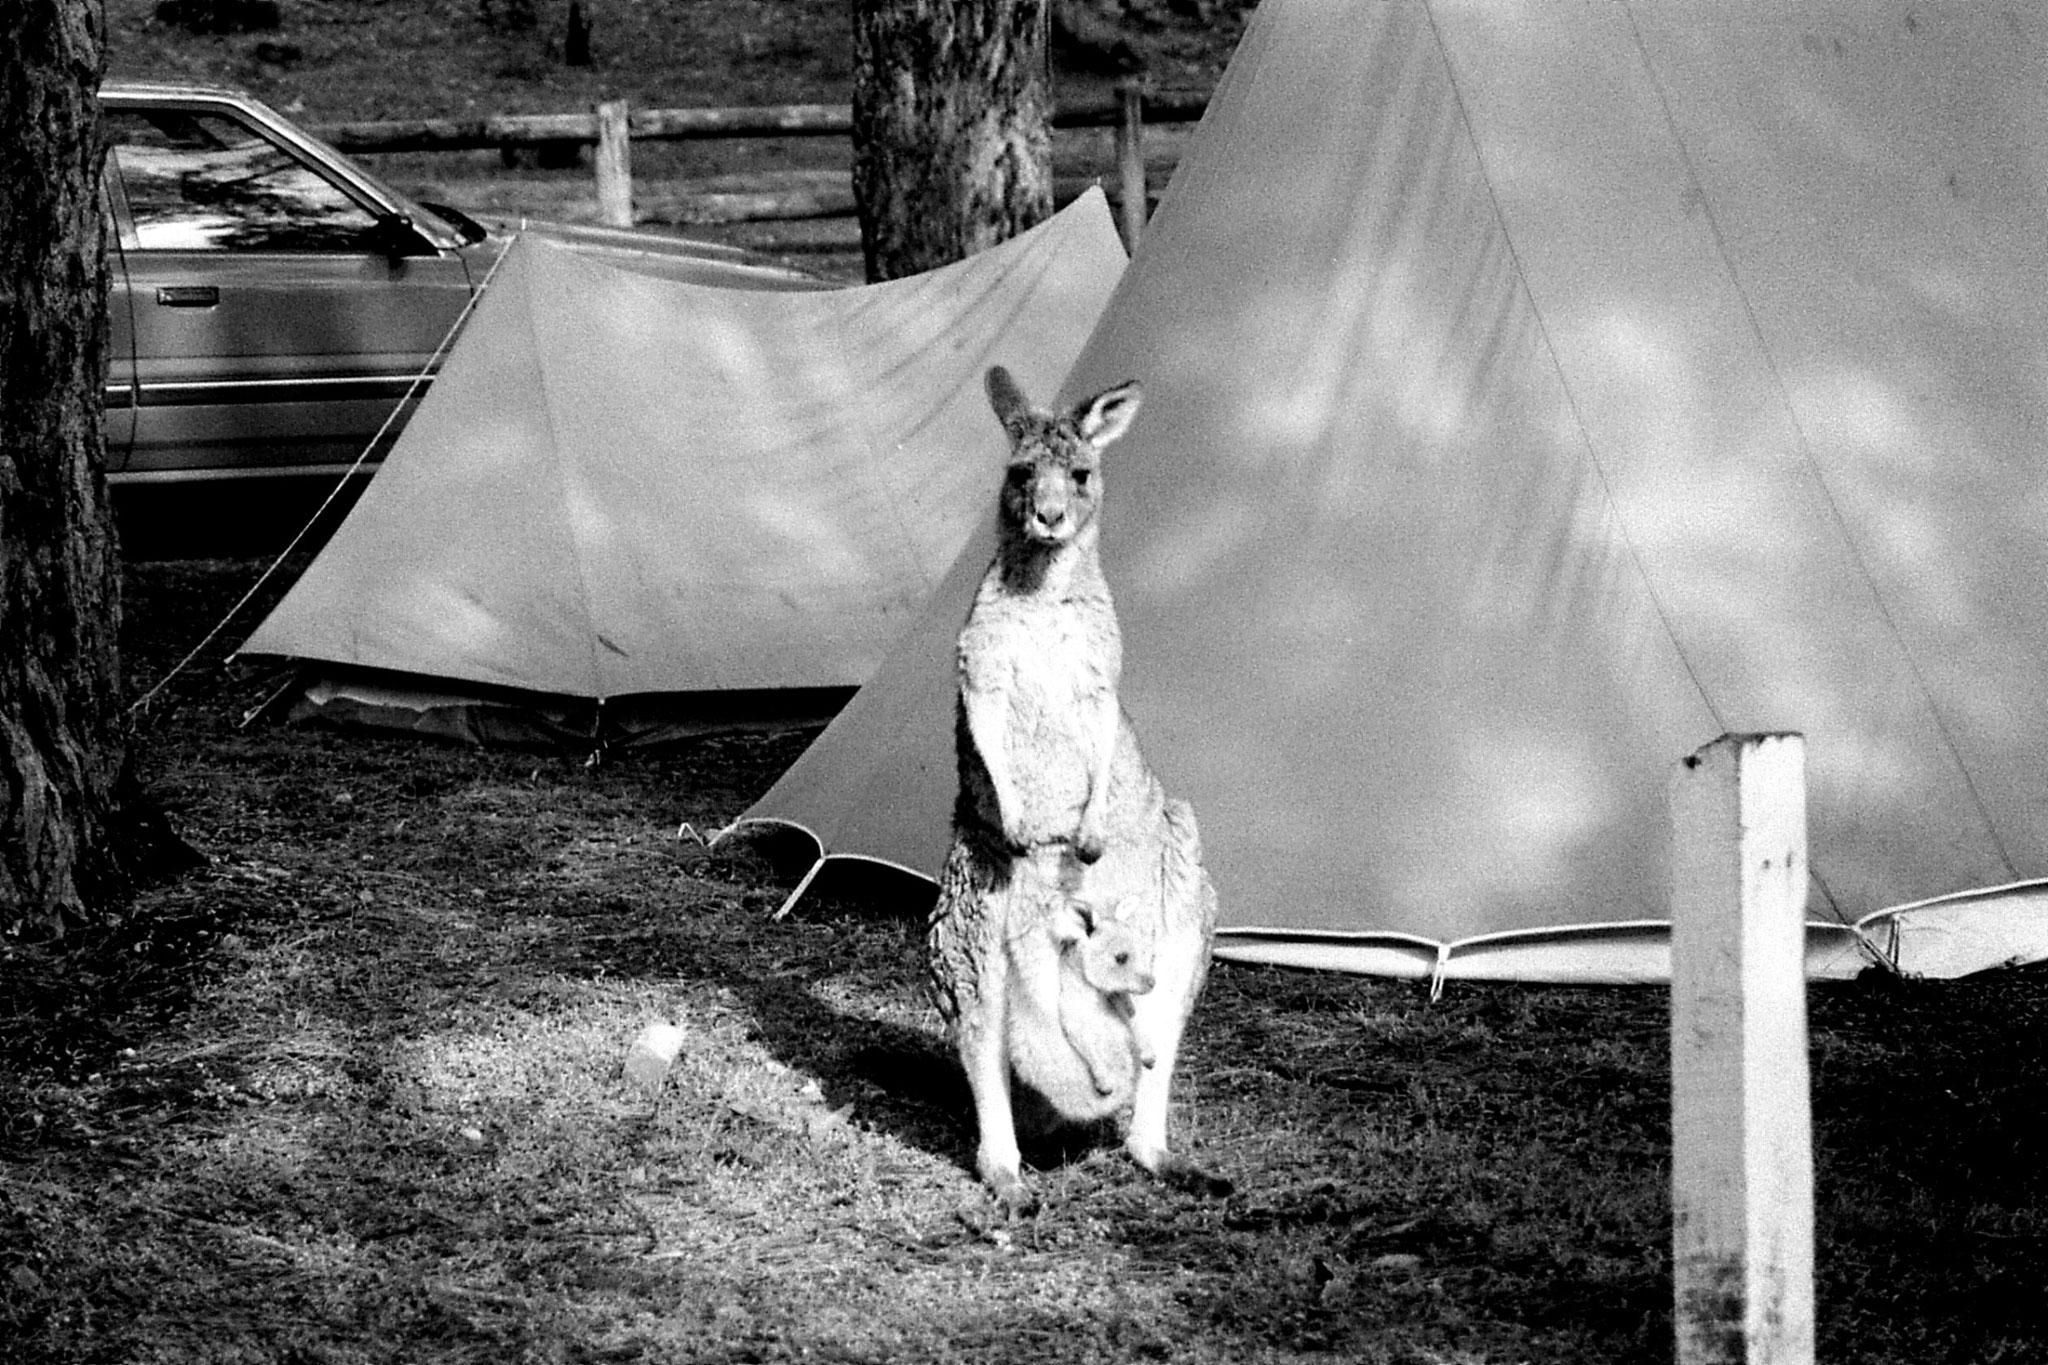 21/9/1990: 26: Grampians Zumsteins campsite